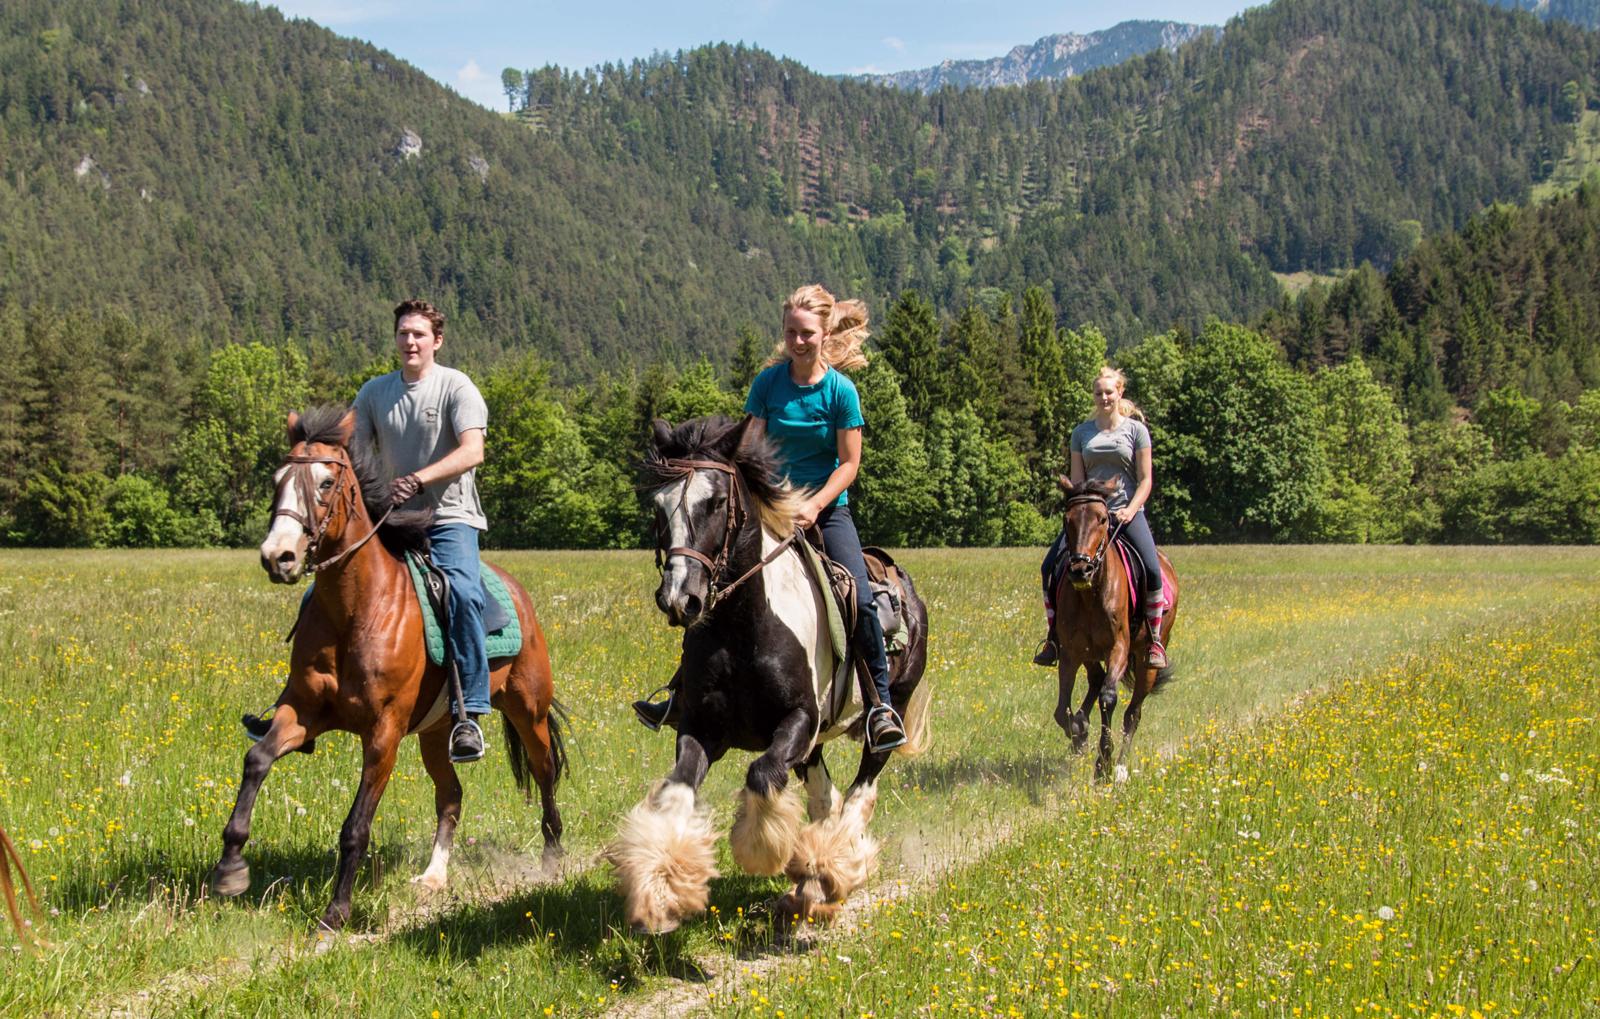 pferde-abenteuer-sankt-aegyd-am-neuwalde-bg1